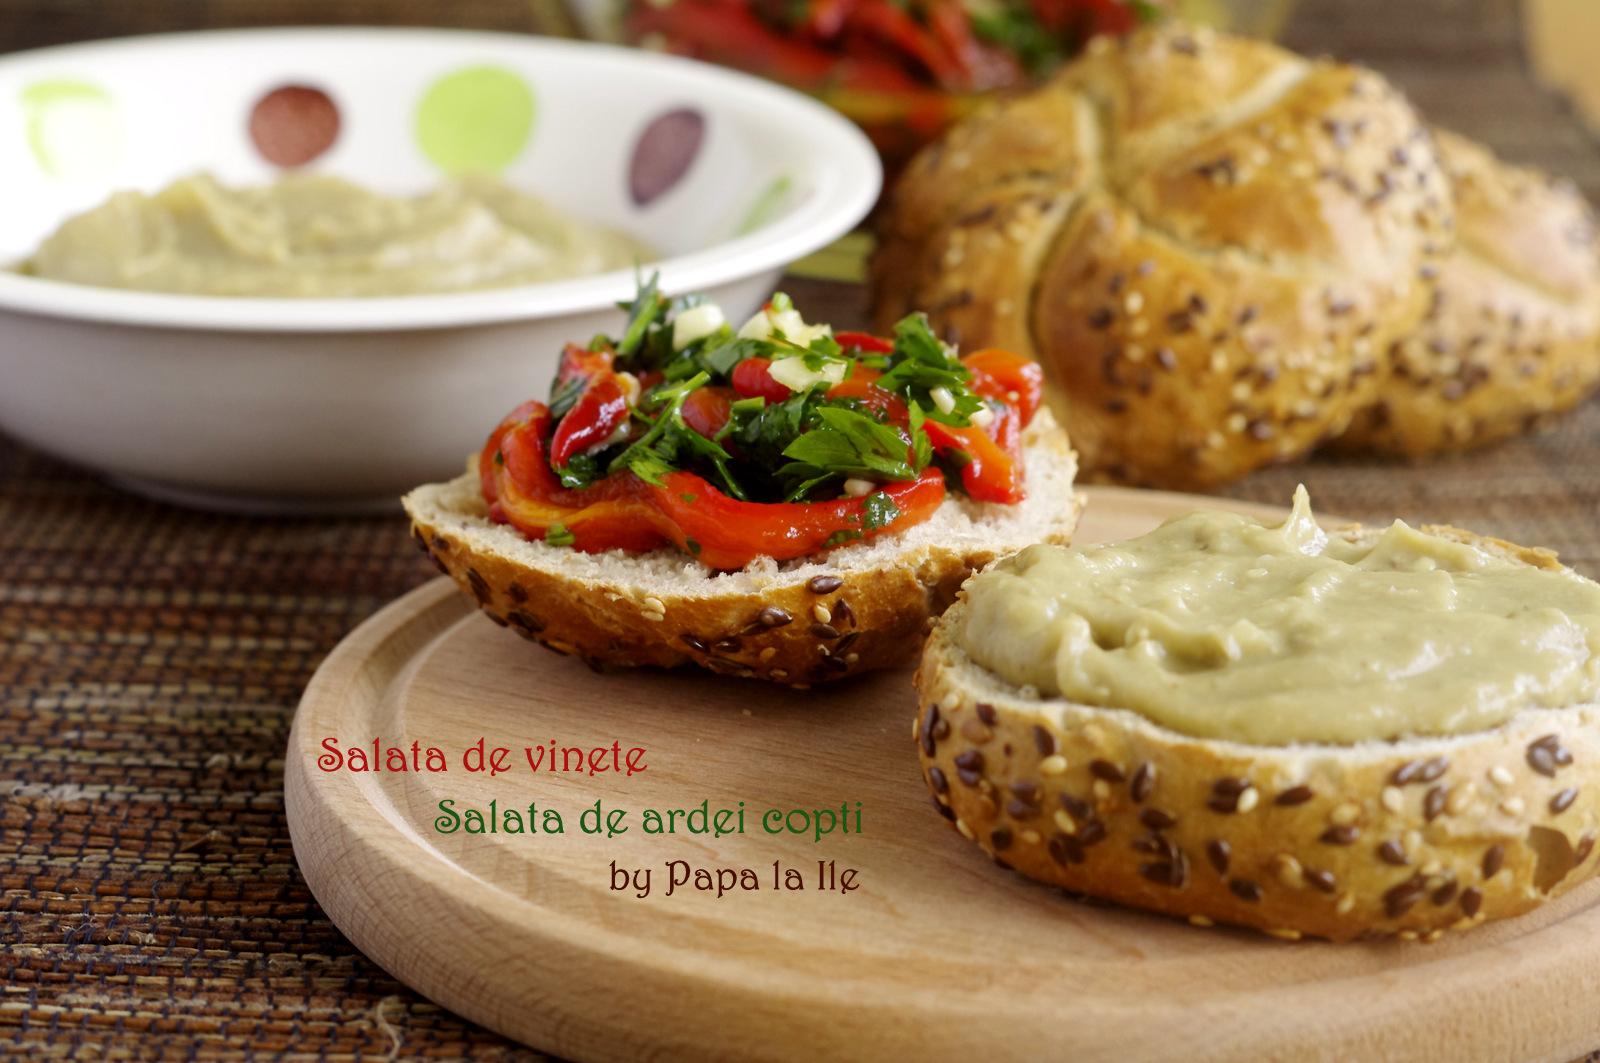 Salata de vinete, salata de ardei copti (6)